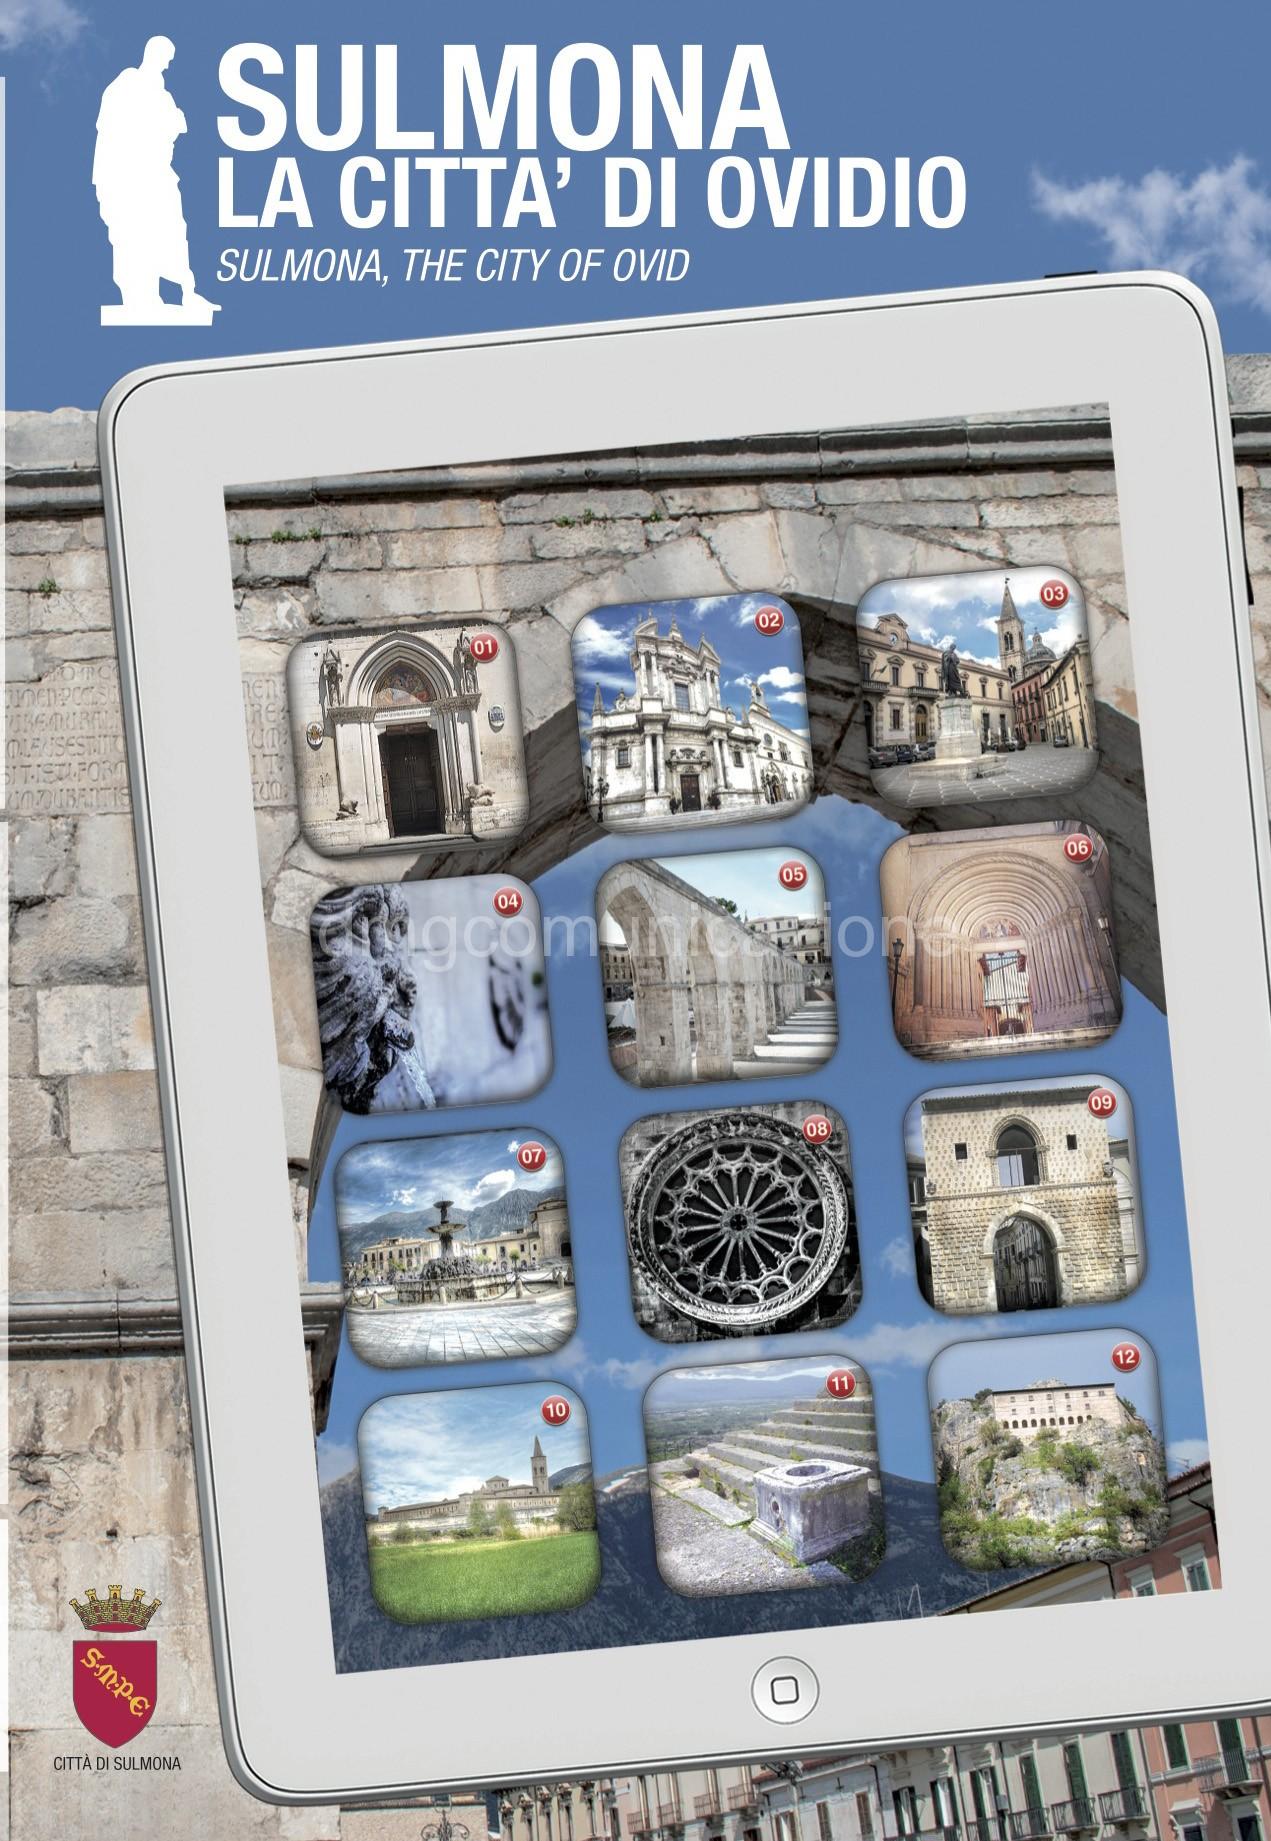 copertina mappa sulmona turismo